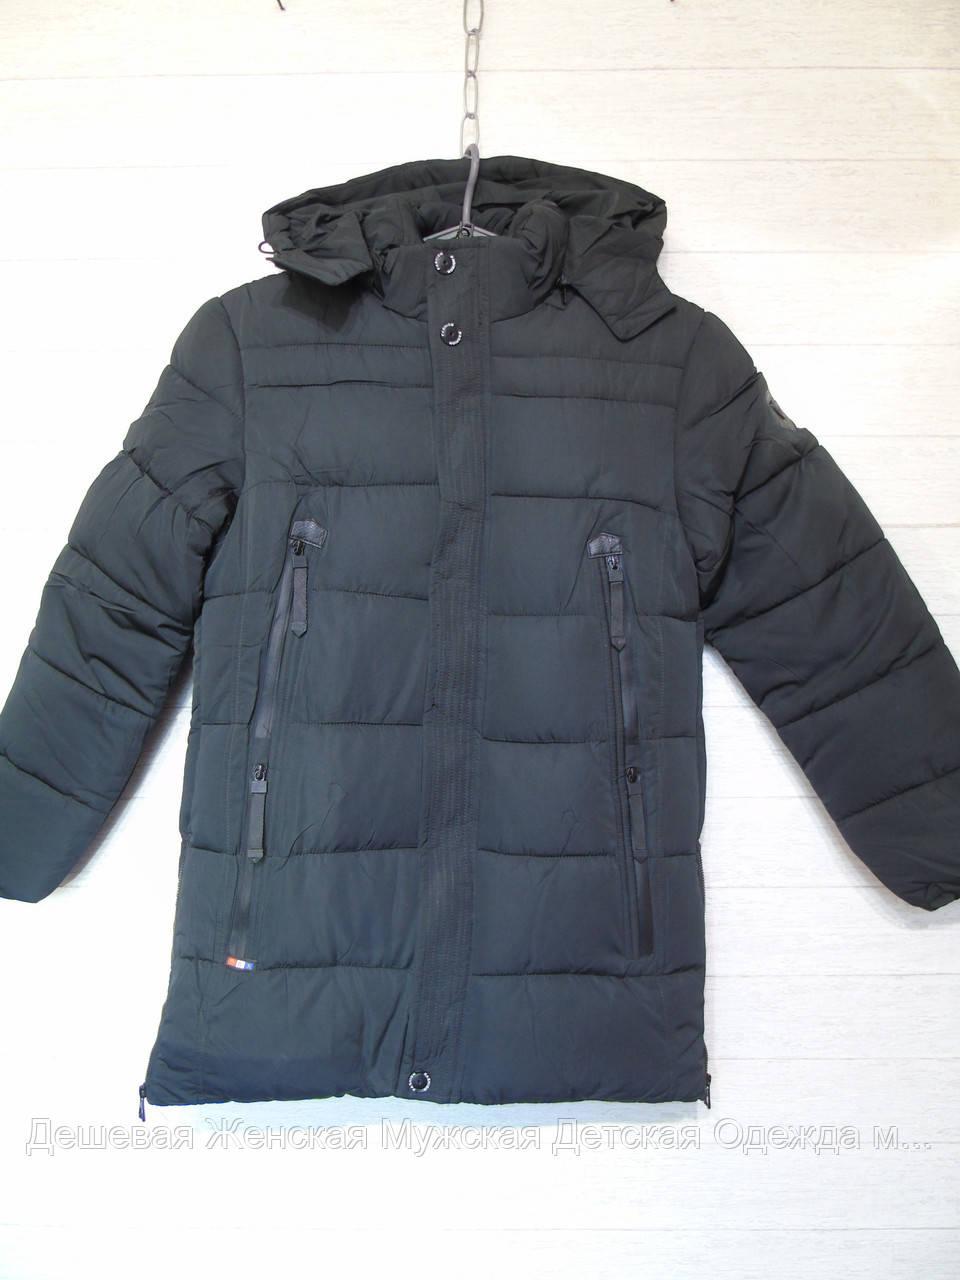 Куртка чоловіча зима